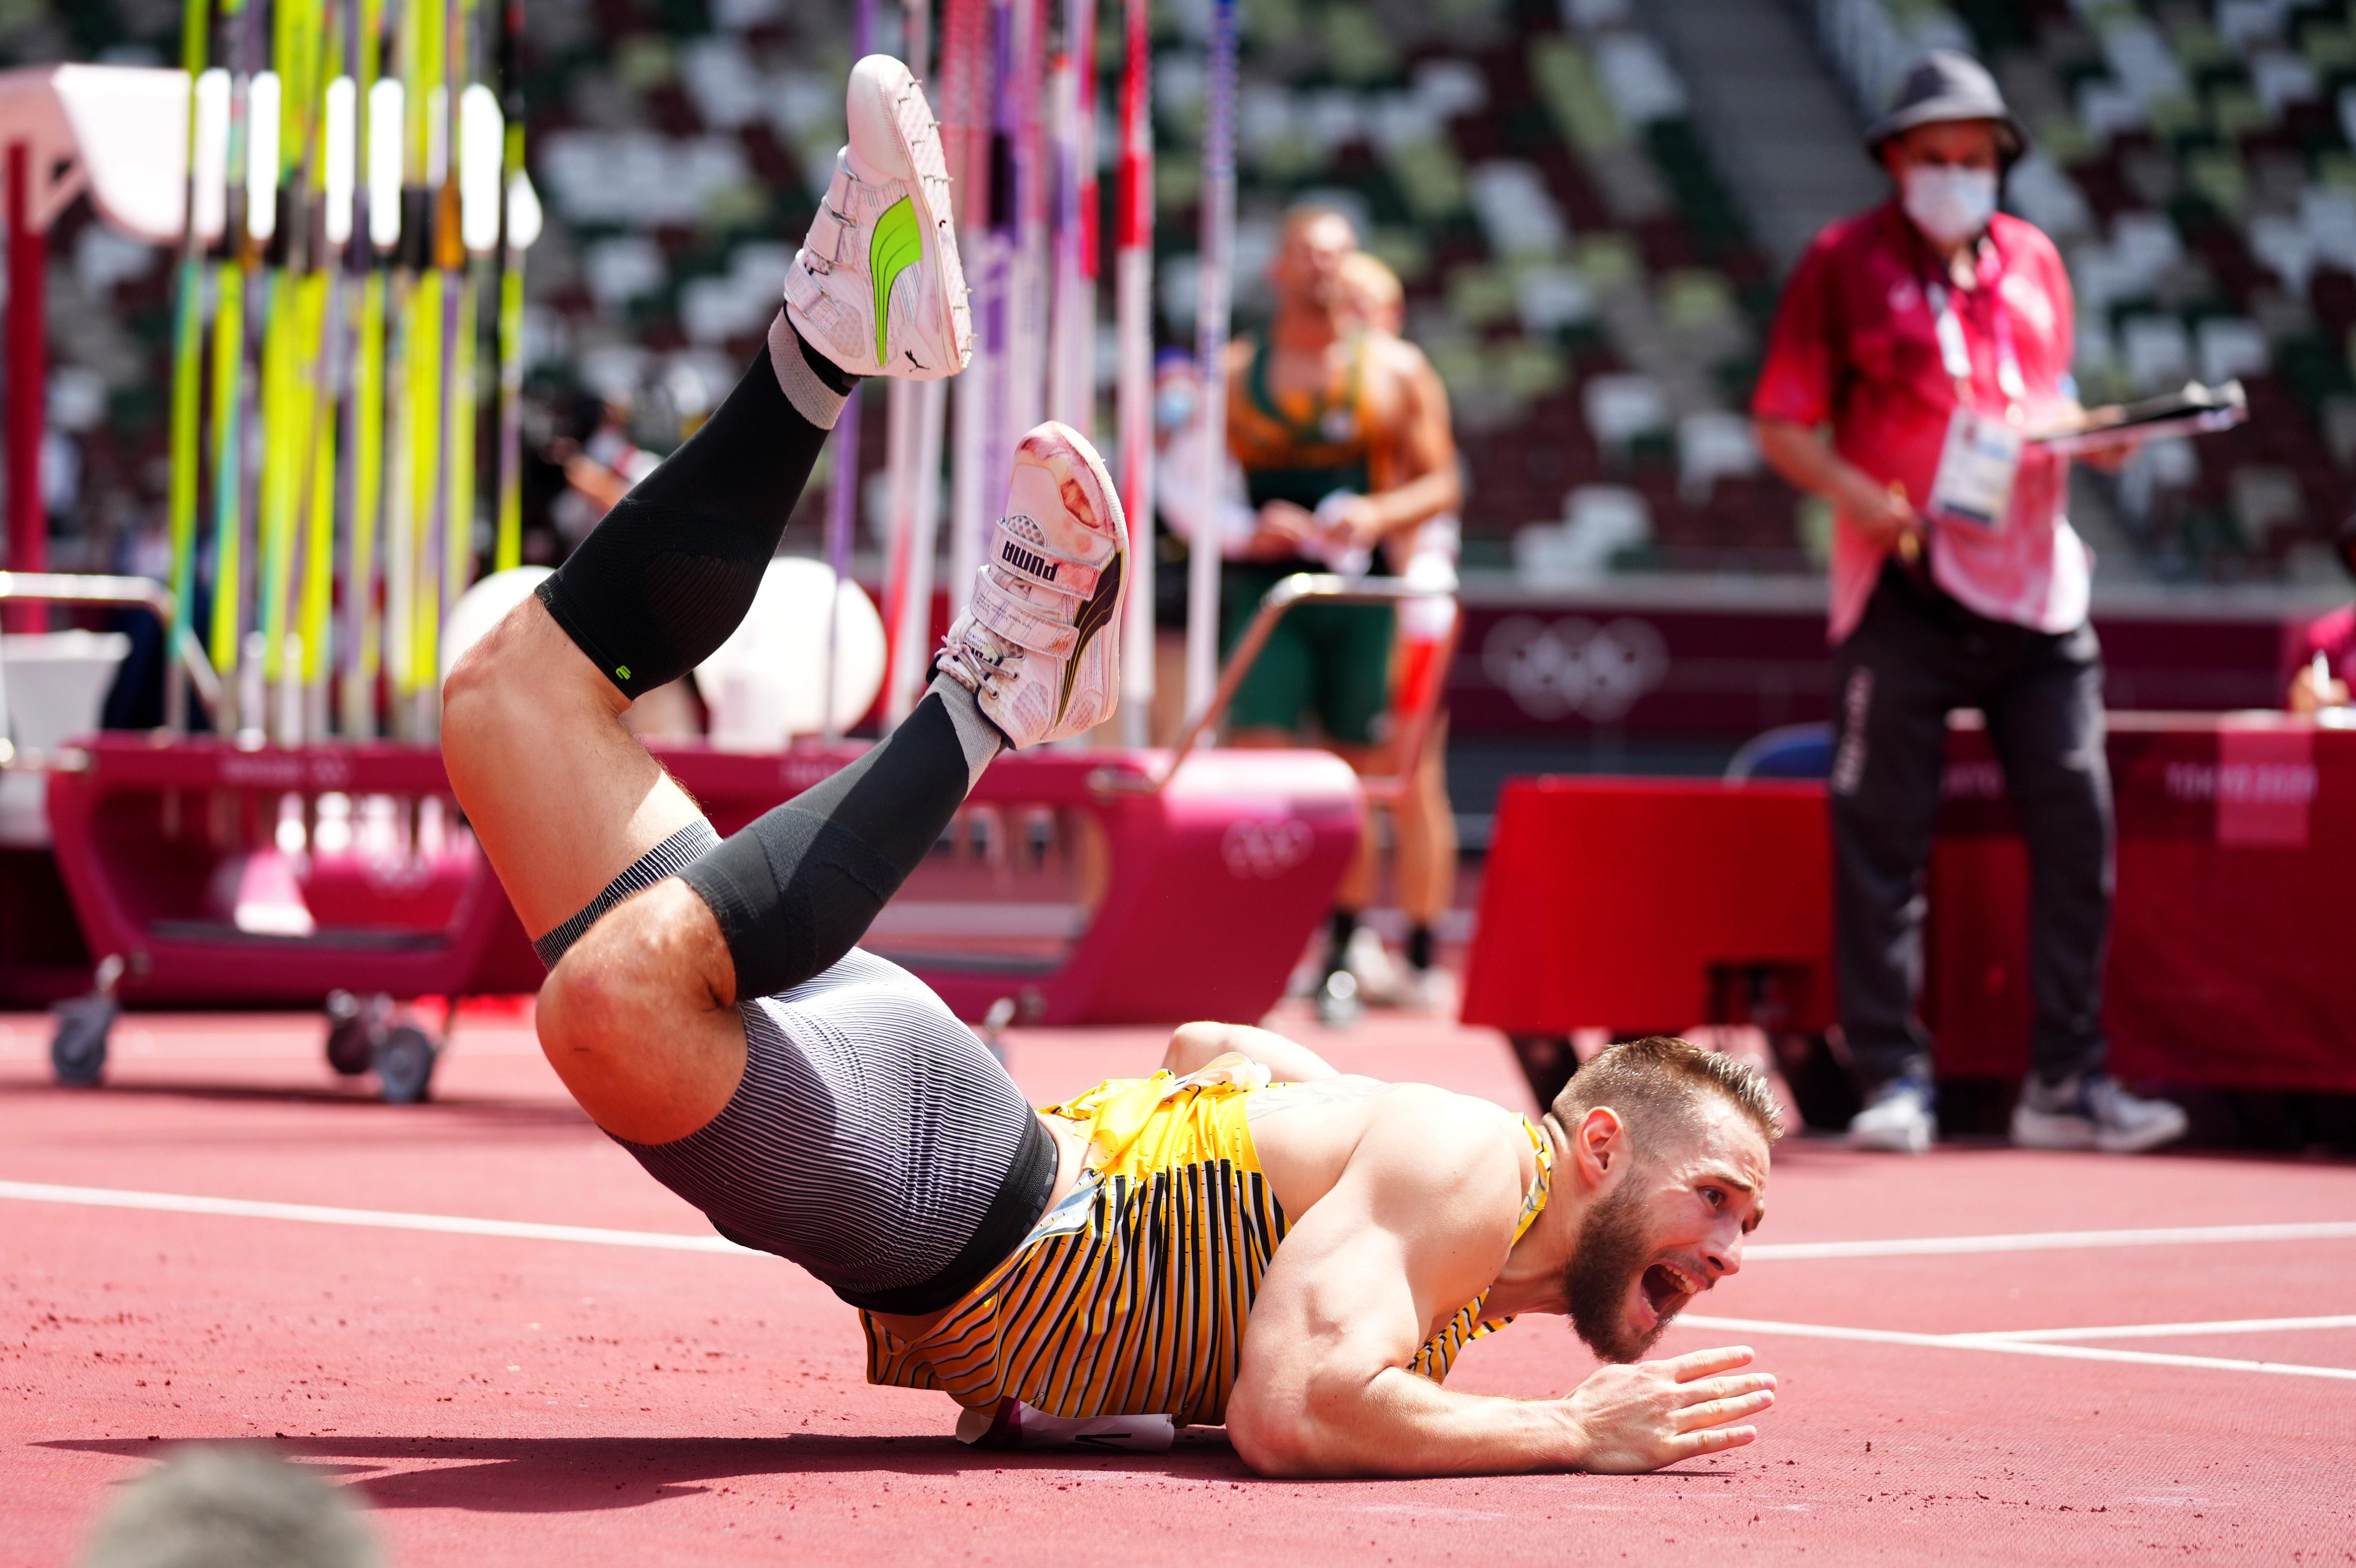 Tokyo 2020 Olympics - Athletics - Men's Javelin Throw - Qualification - Olympic Stadium, Tokyo, Japan - August 4, 2021. Johannes Vetter of Germany  reacts REUTERS/Aleksandra Szmigiel - SP1EH84054TU5